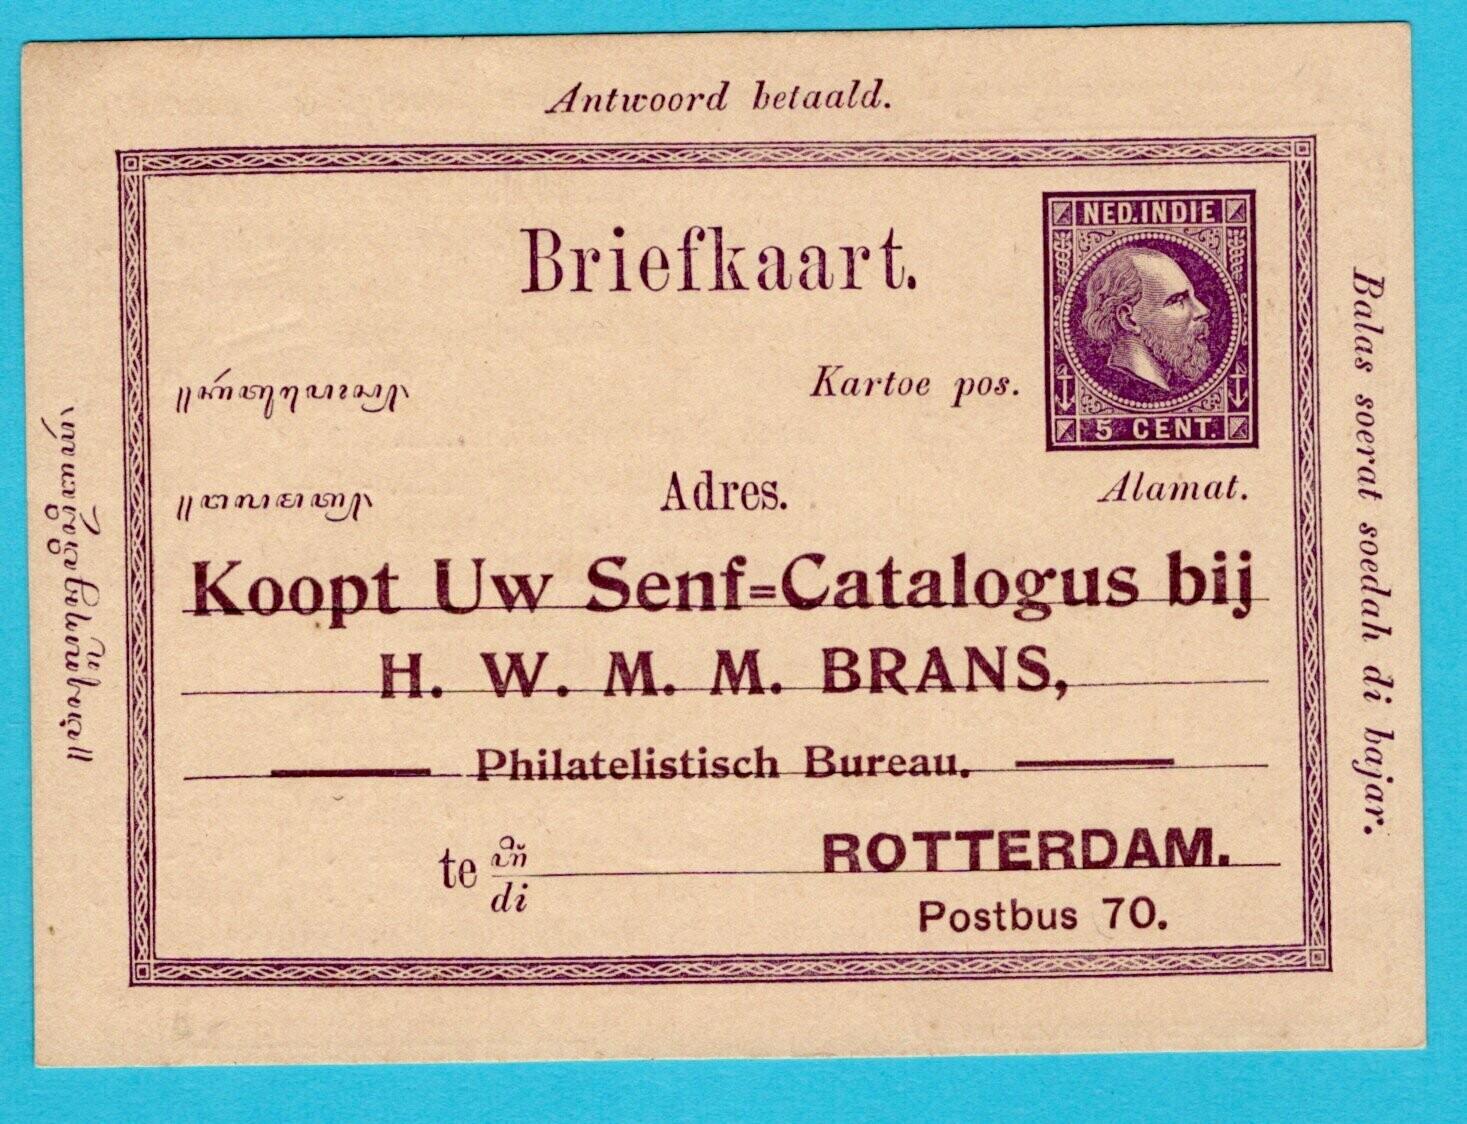 NETHERLANDS EAST INDIES postal card used for Senf advertising